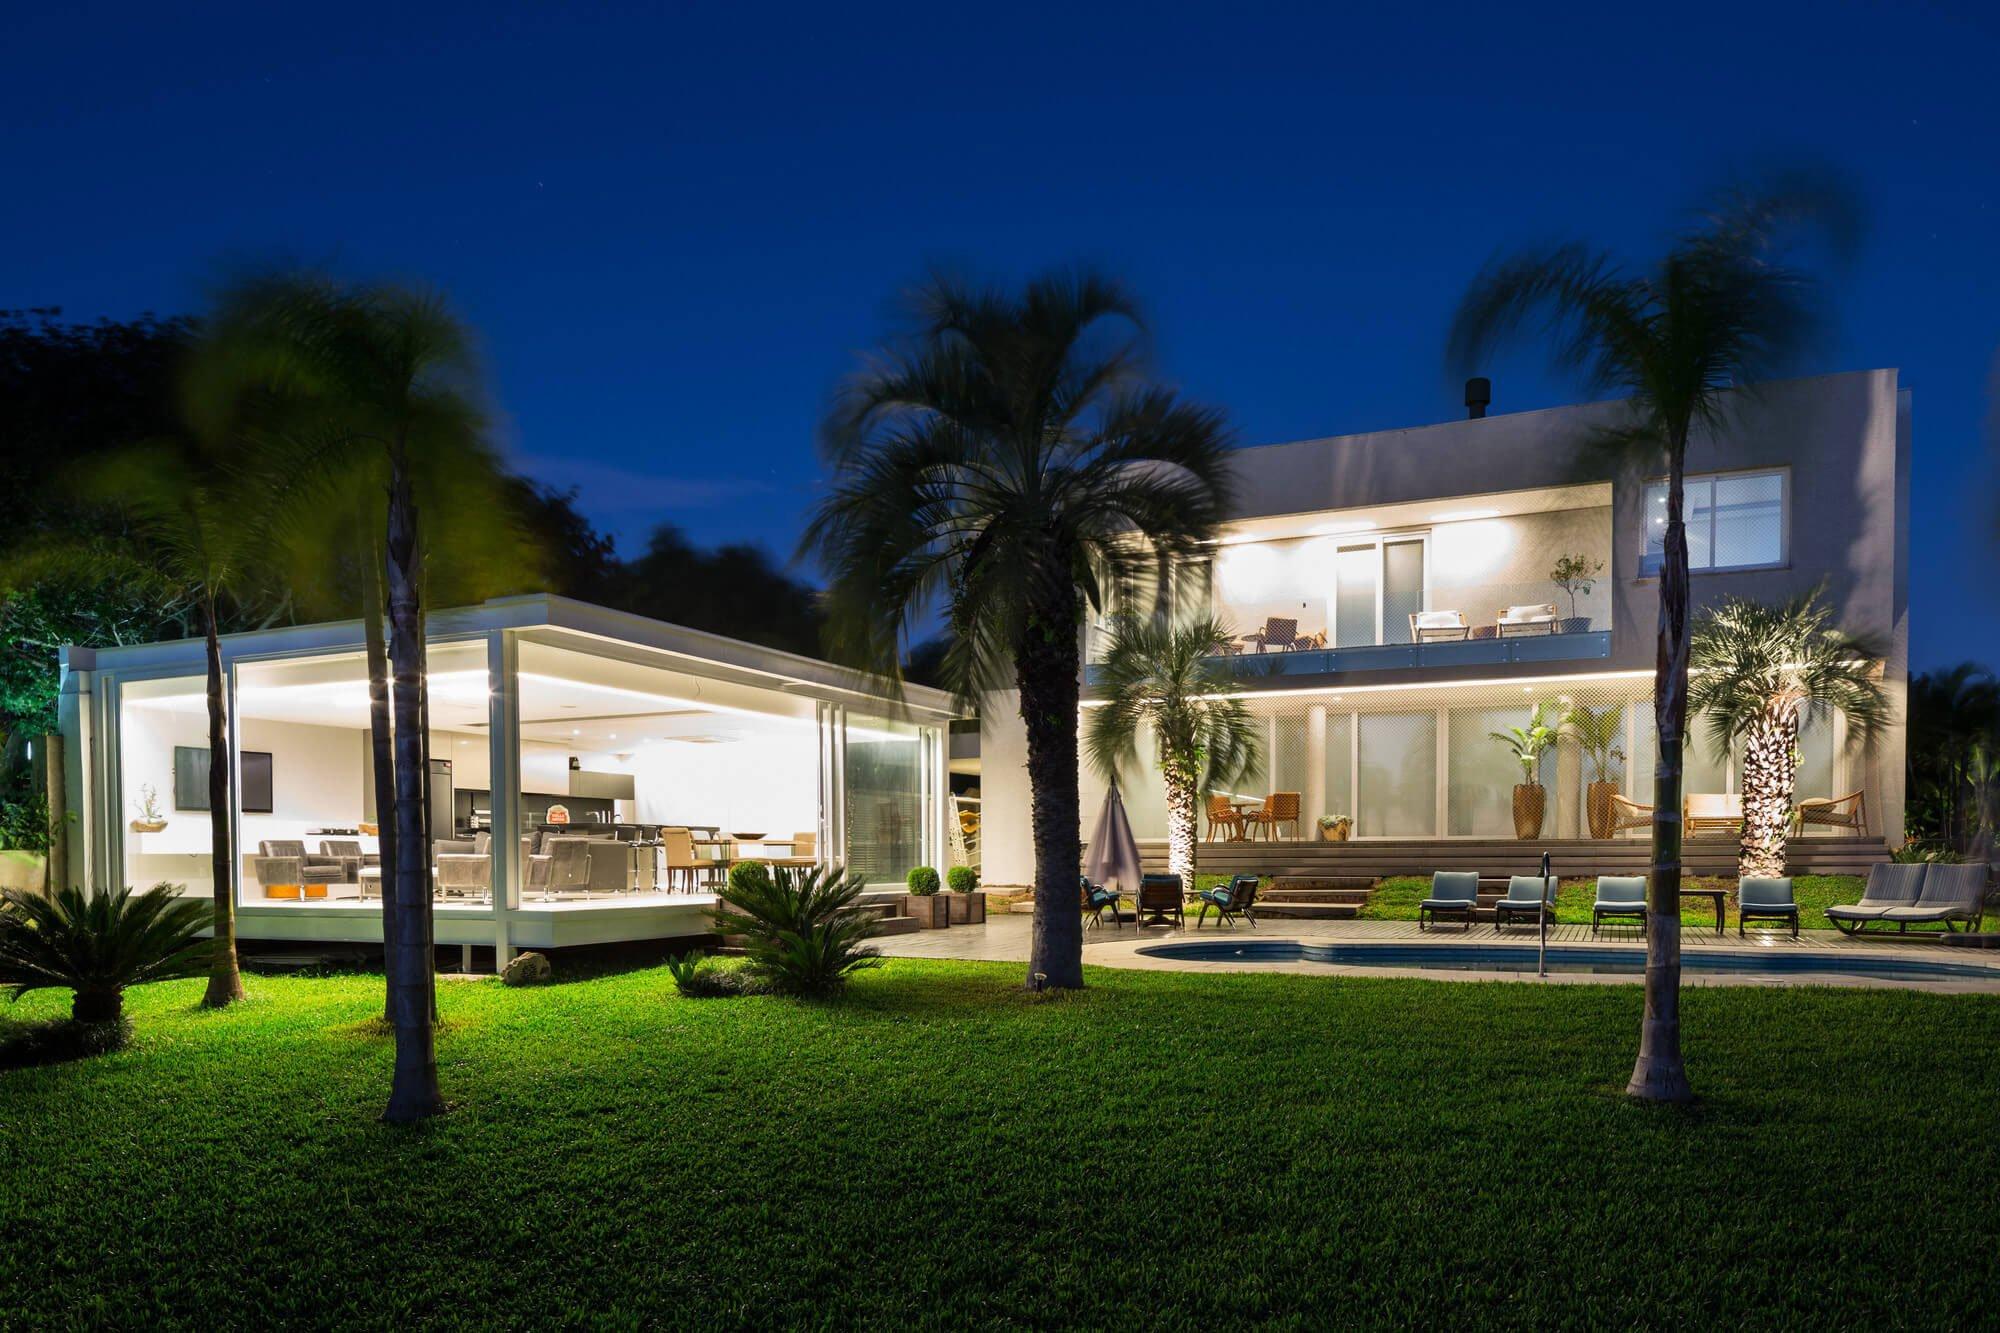 Pool-House-in-Porto-Alegre-25